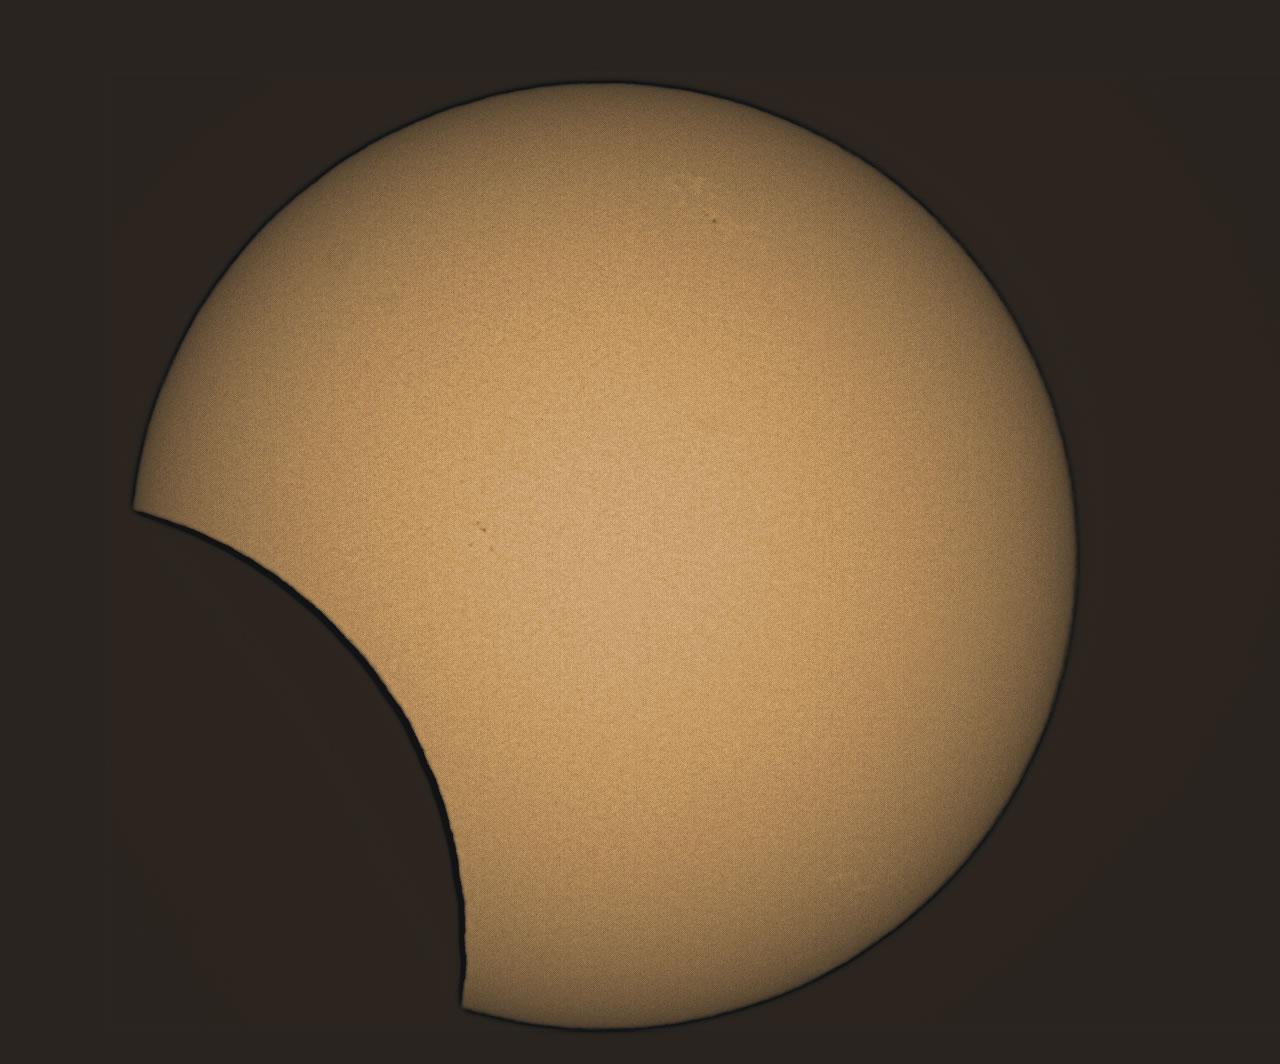 Solar Partial Eclipse 2021